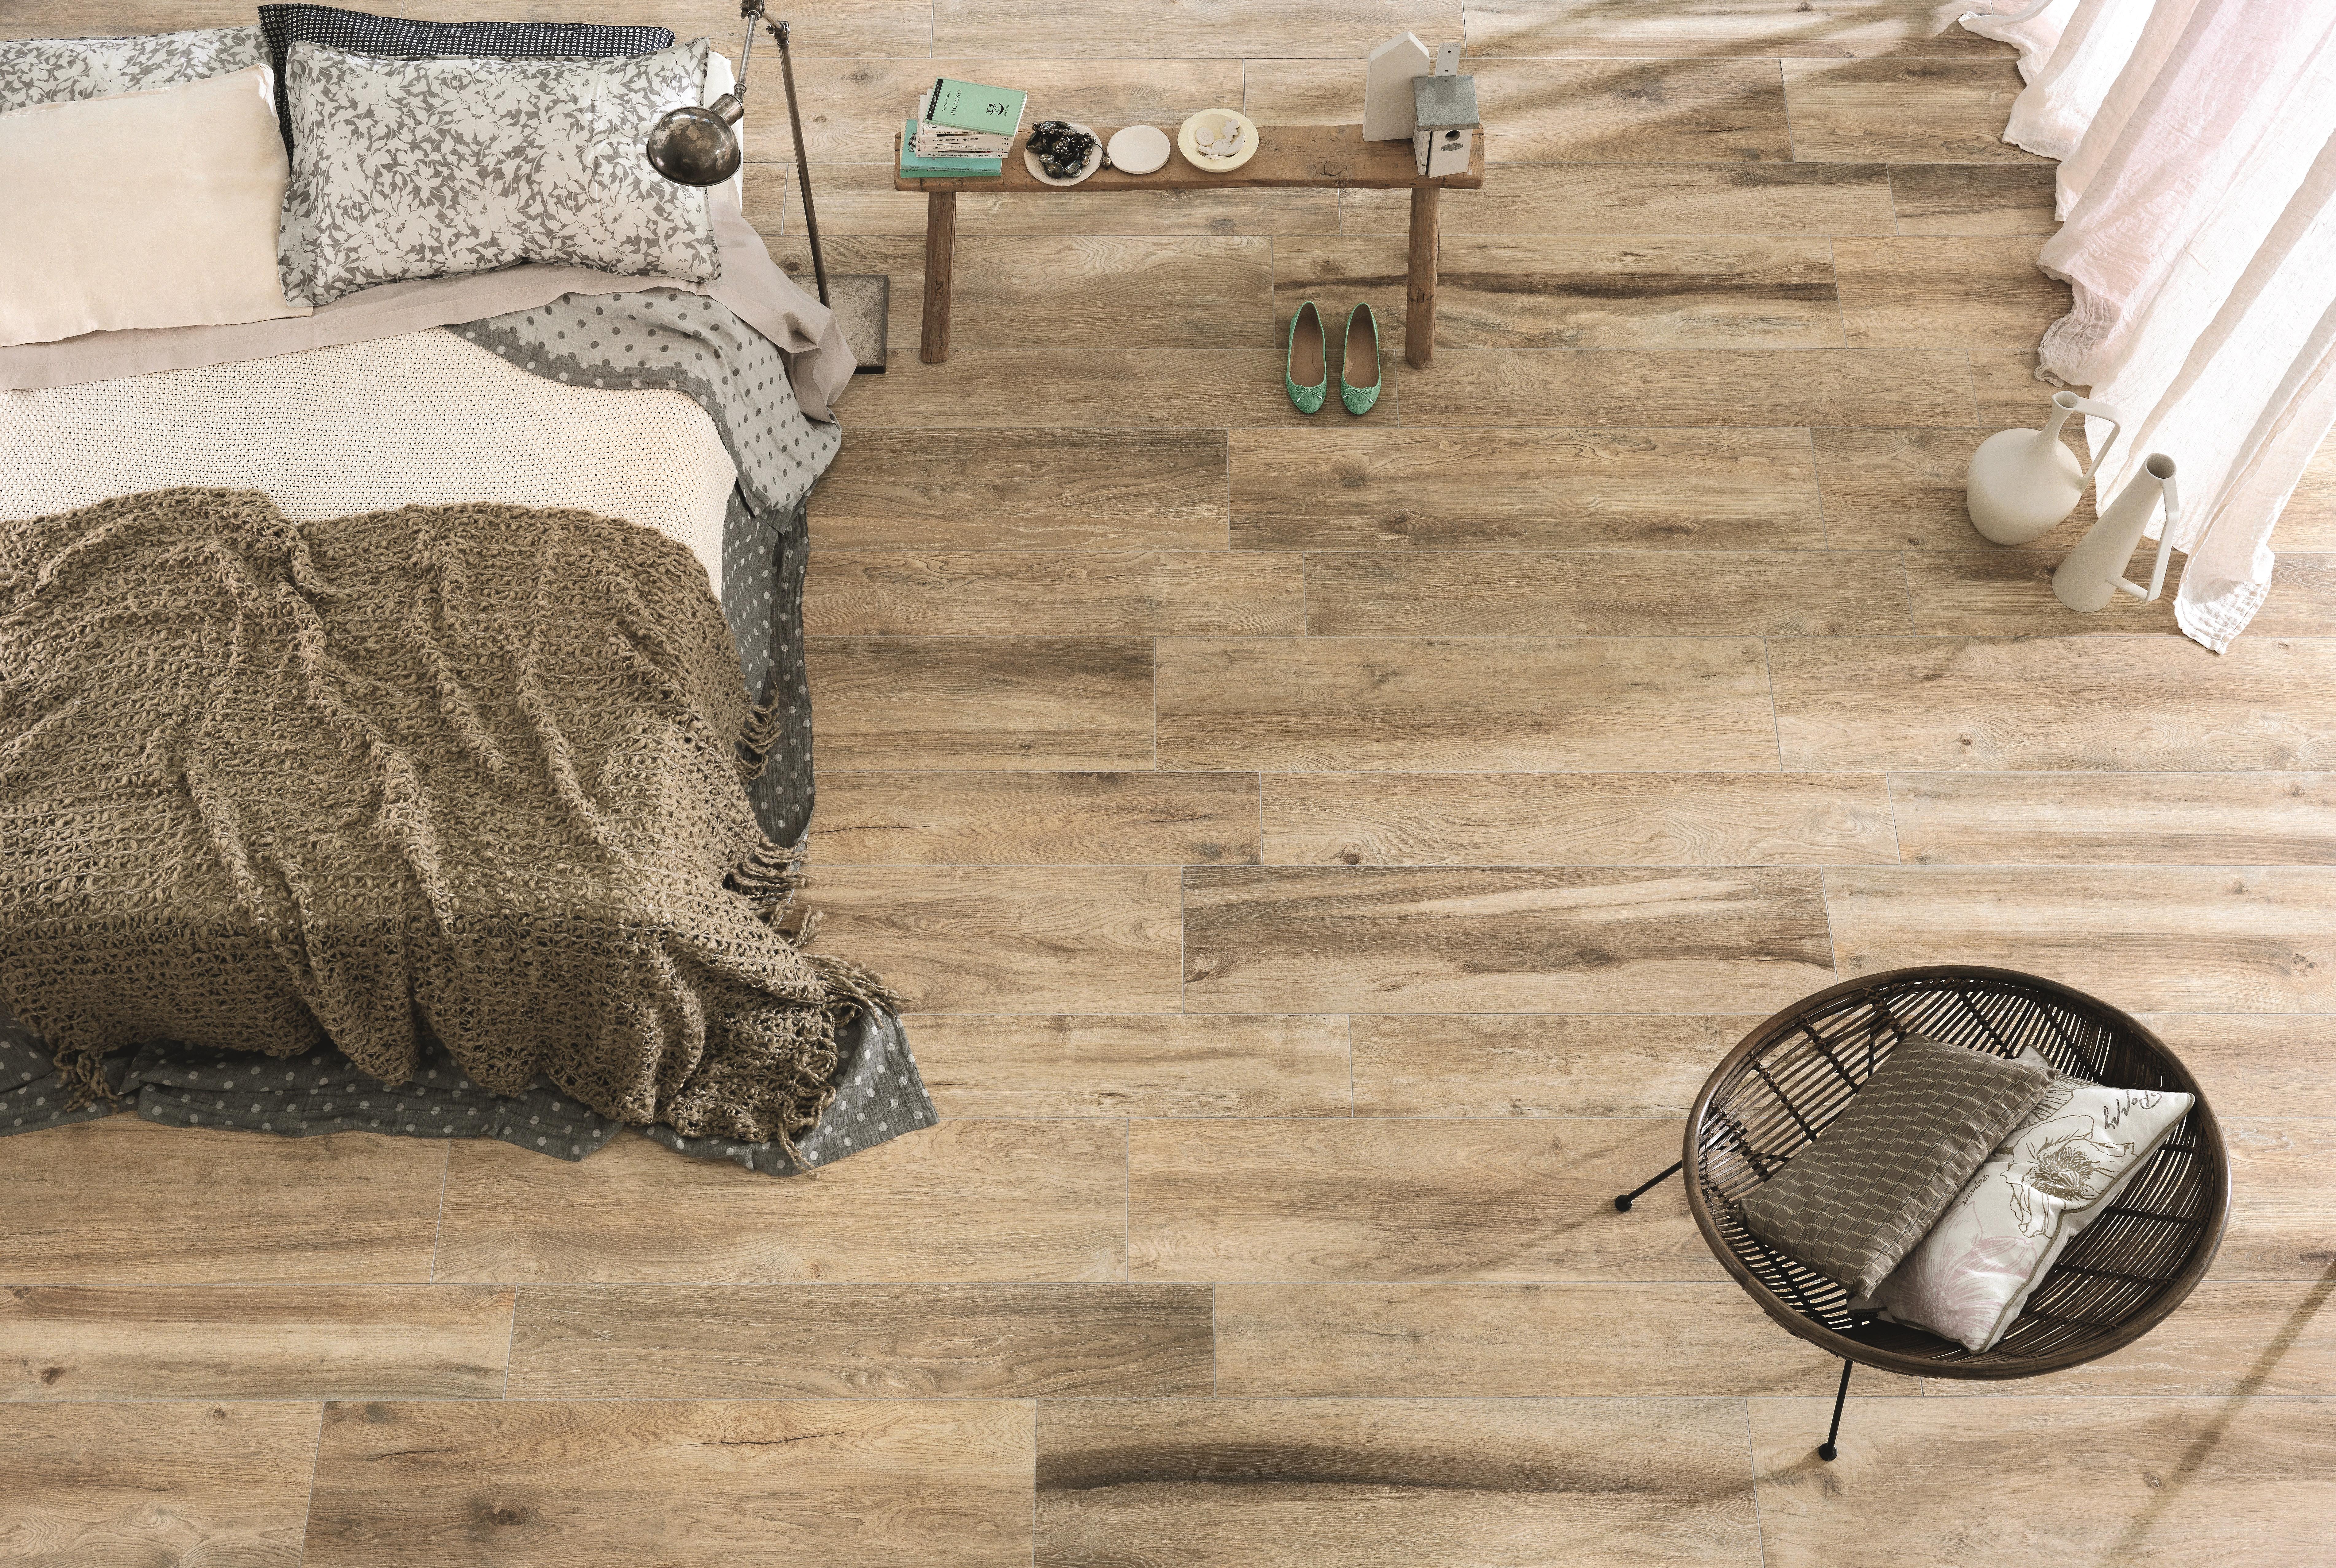 ceramic tile vs hardwood flooring cost of wood effect porcelain tiles in wood effect porcelain tiles wood effect porcelain tiles